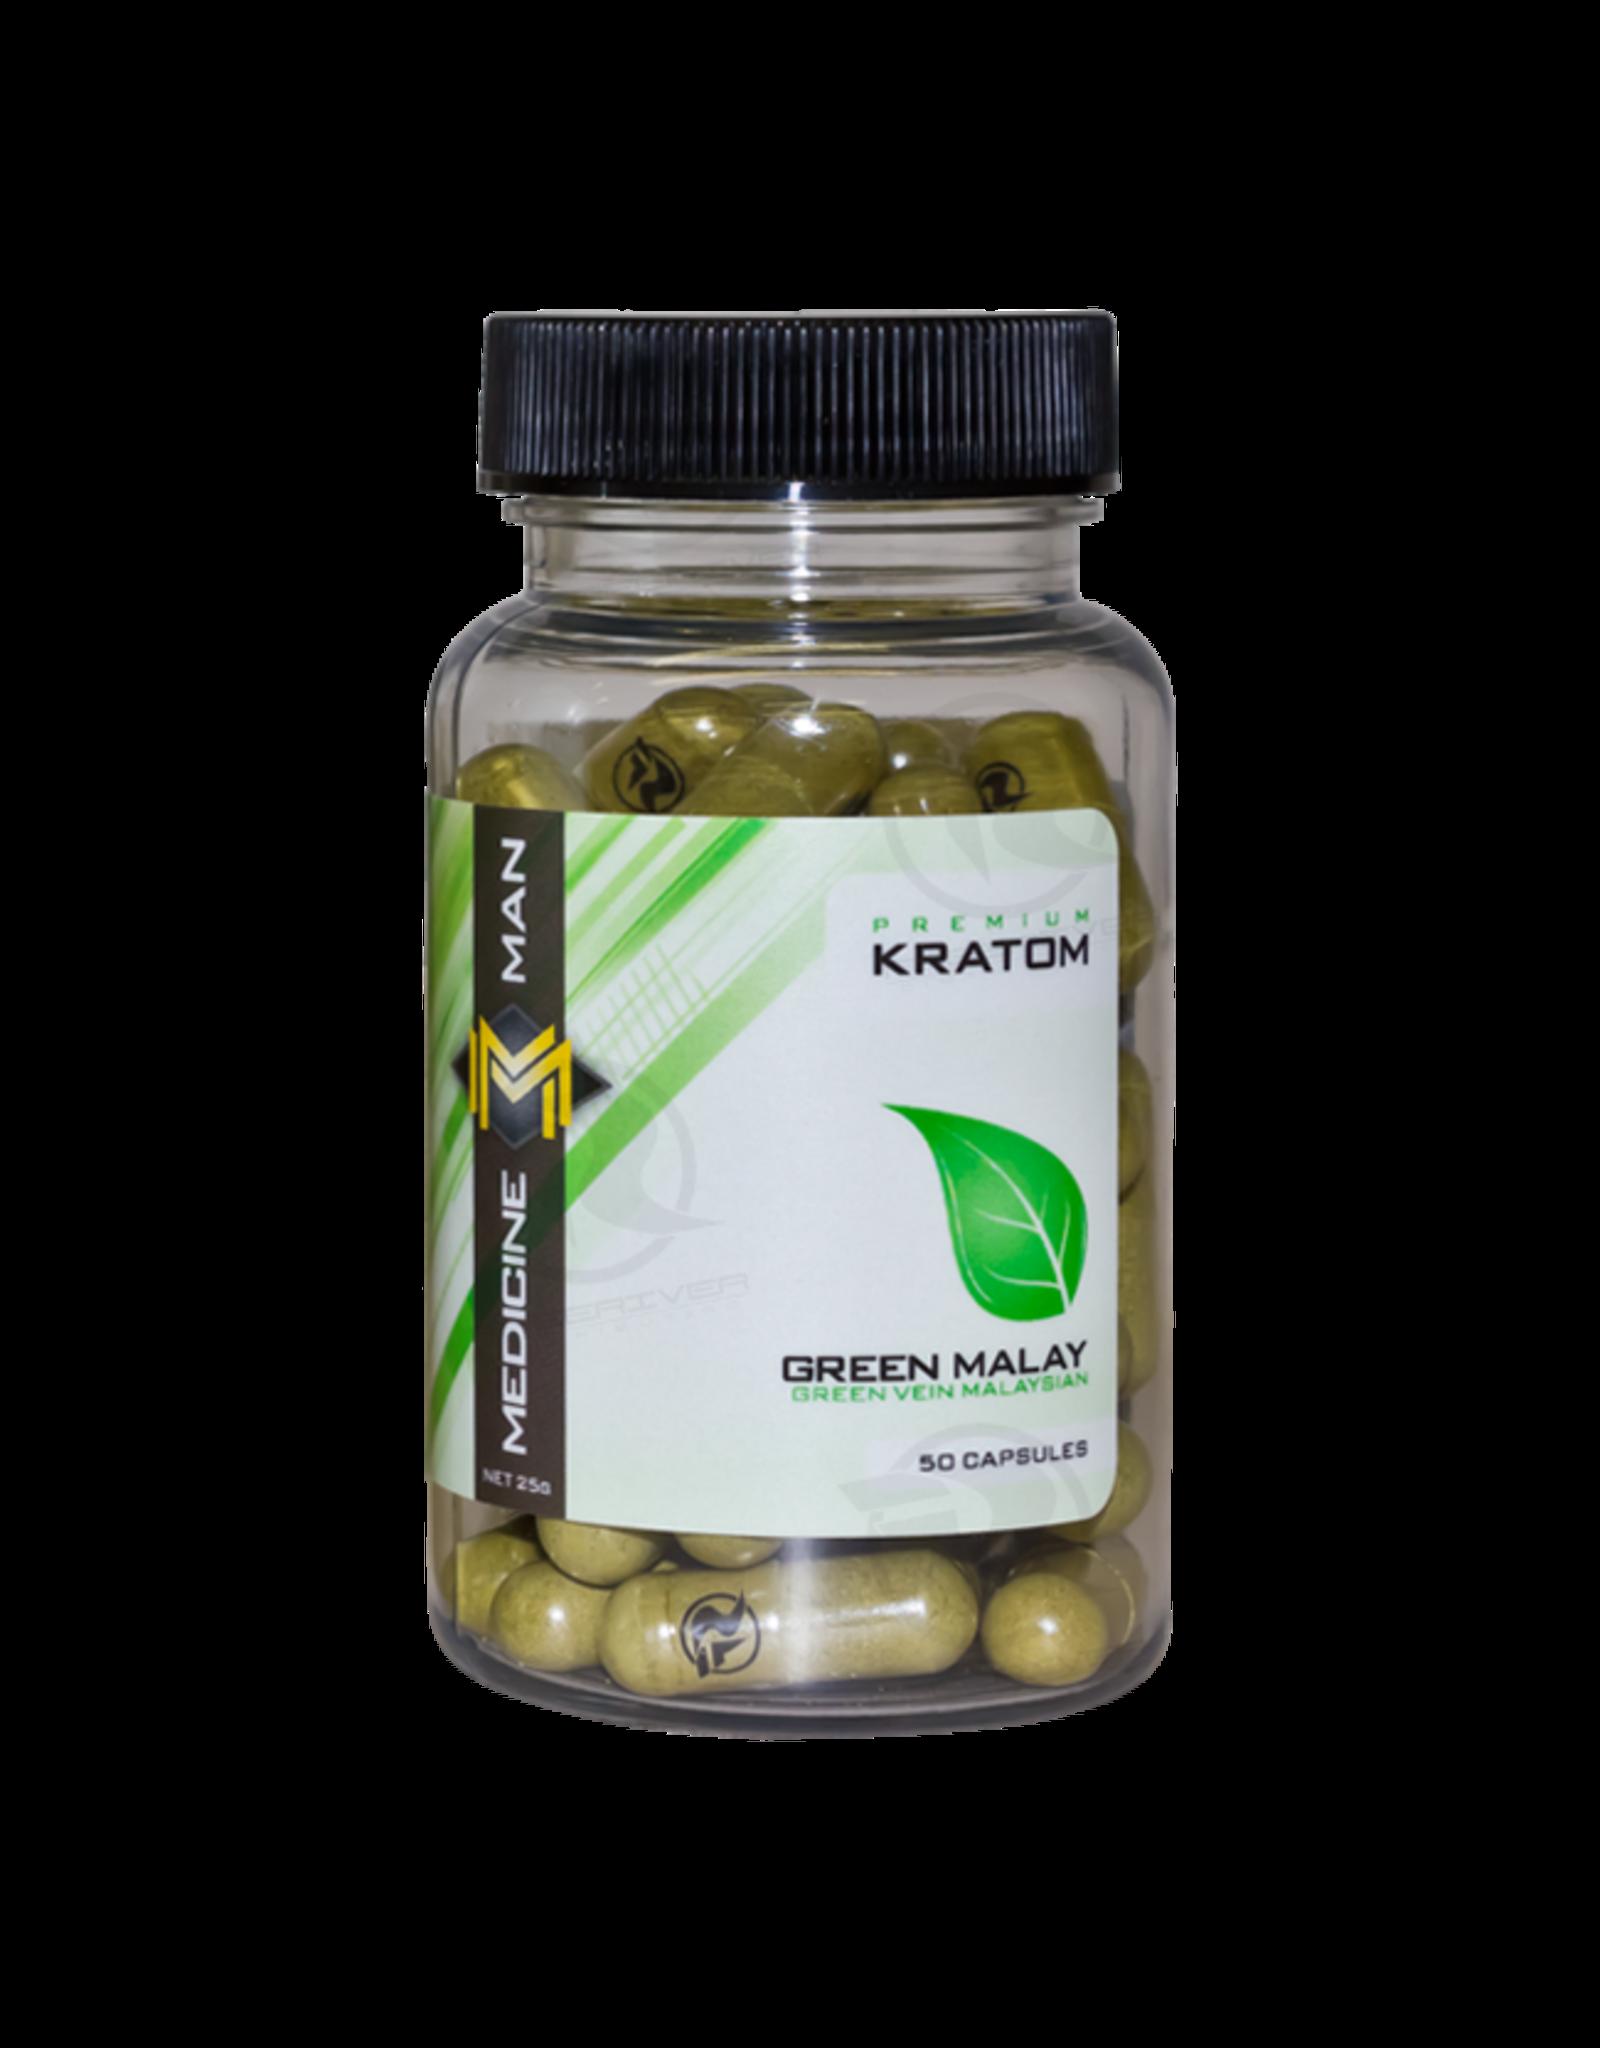 Medicine Man Kratom Green Malay 50 Caps